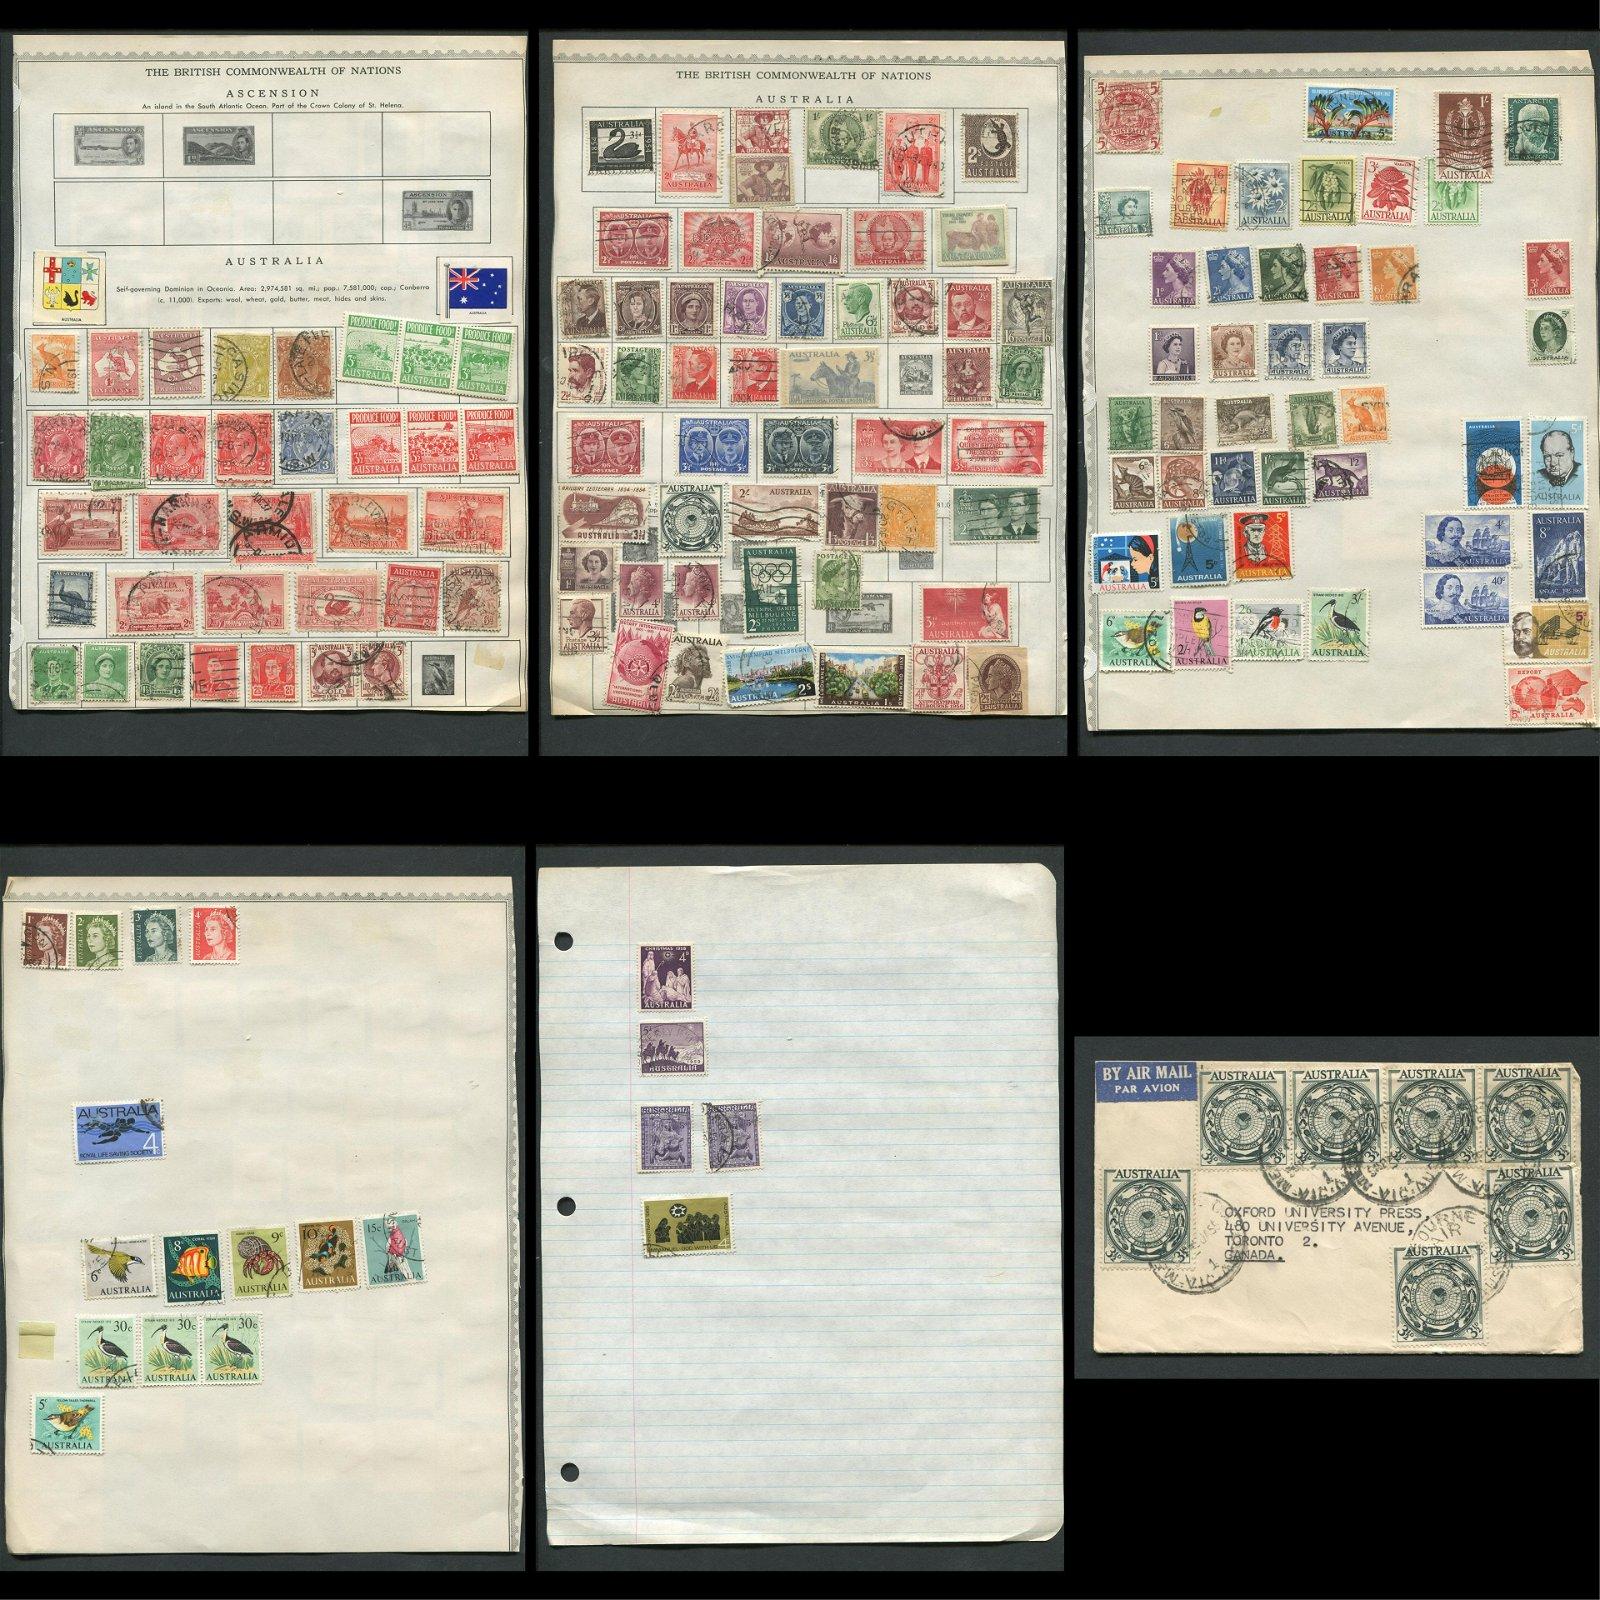 Australia Stamp Collection 7